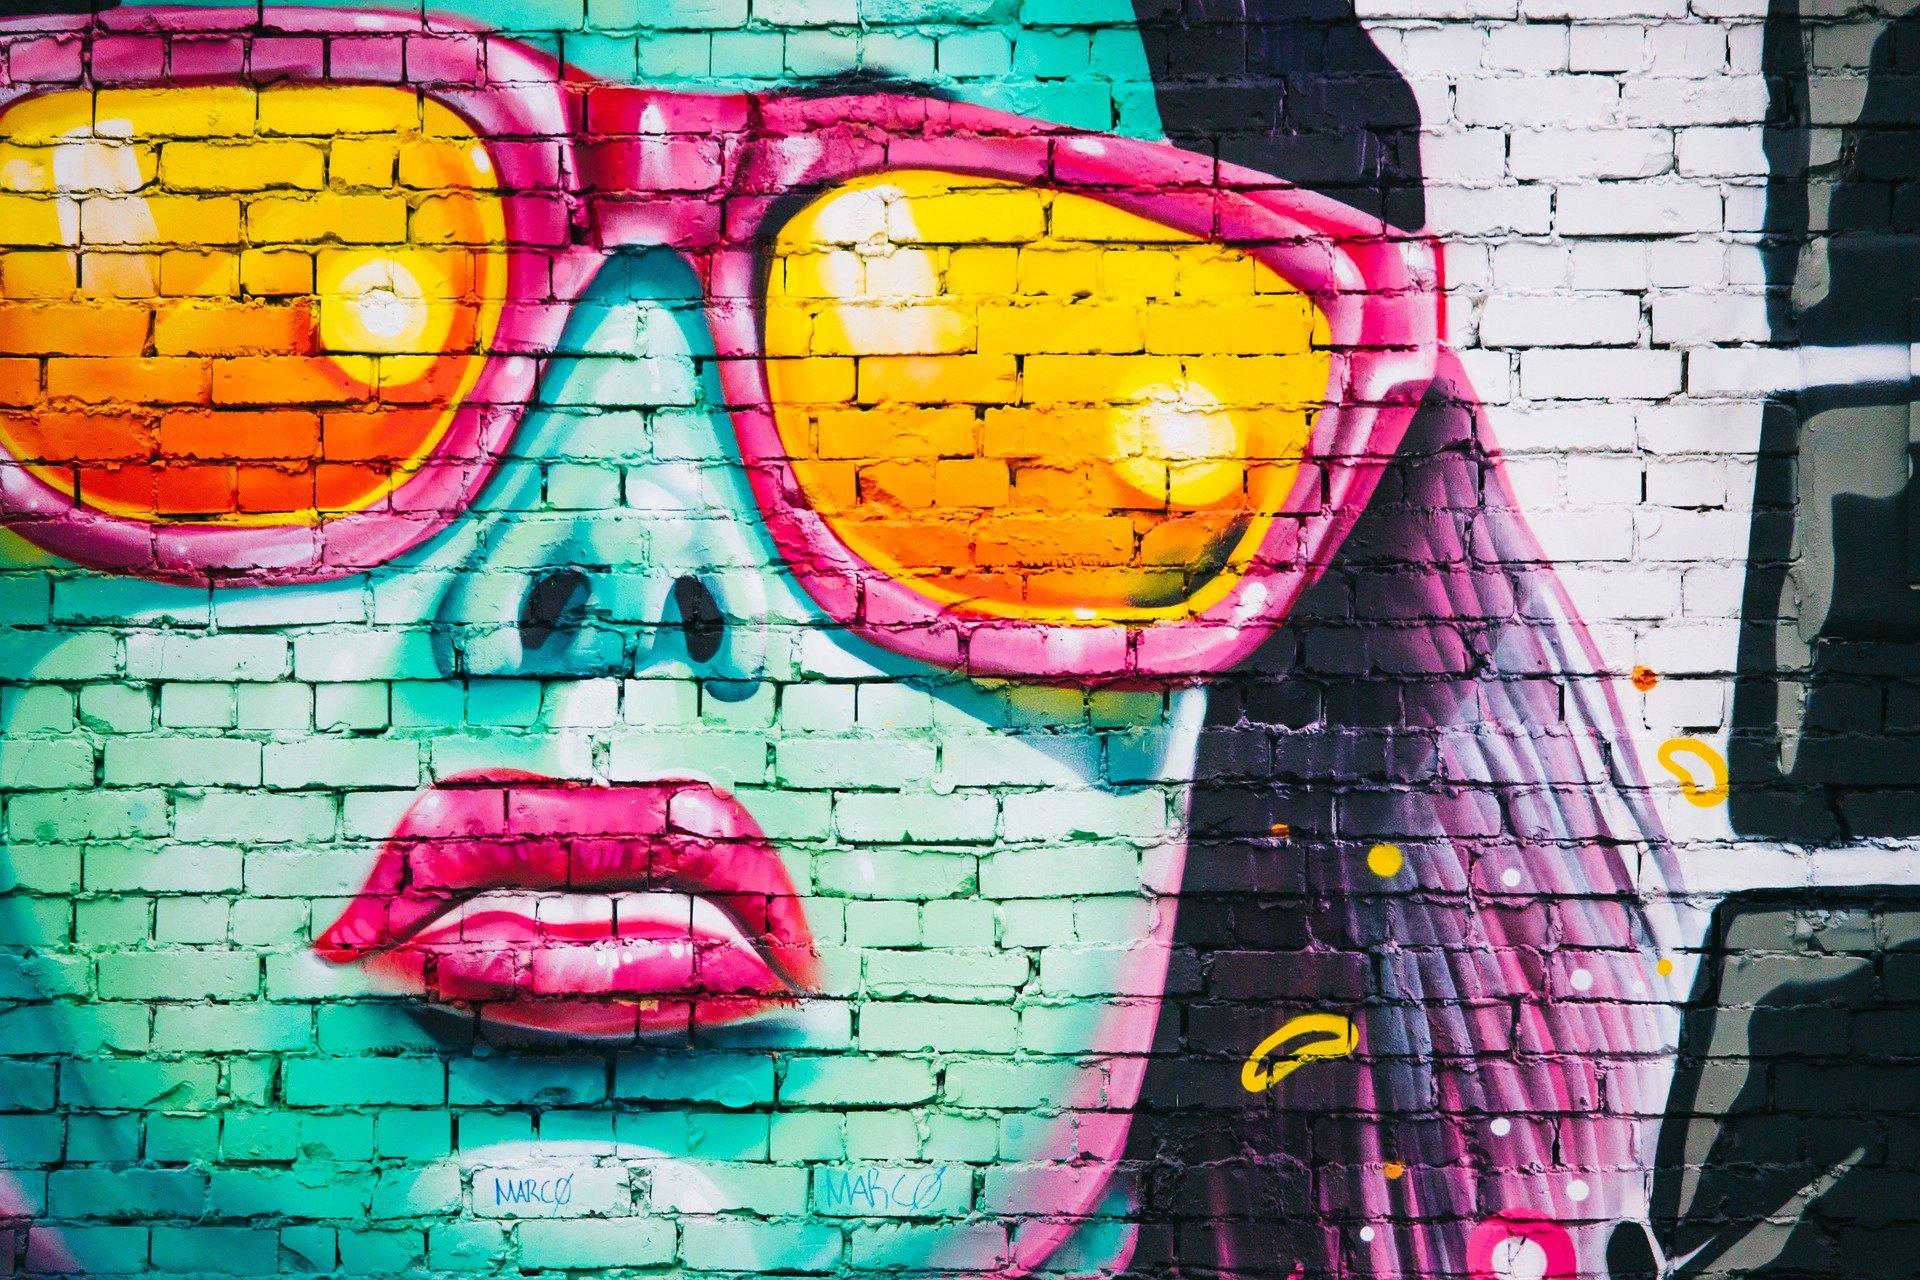 graffiti-wall-1209761_1920 (1)